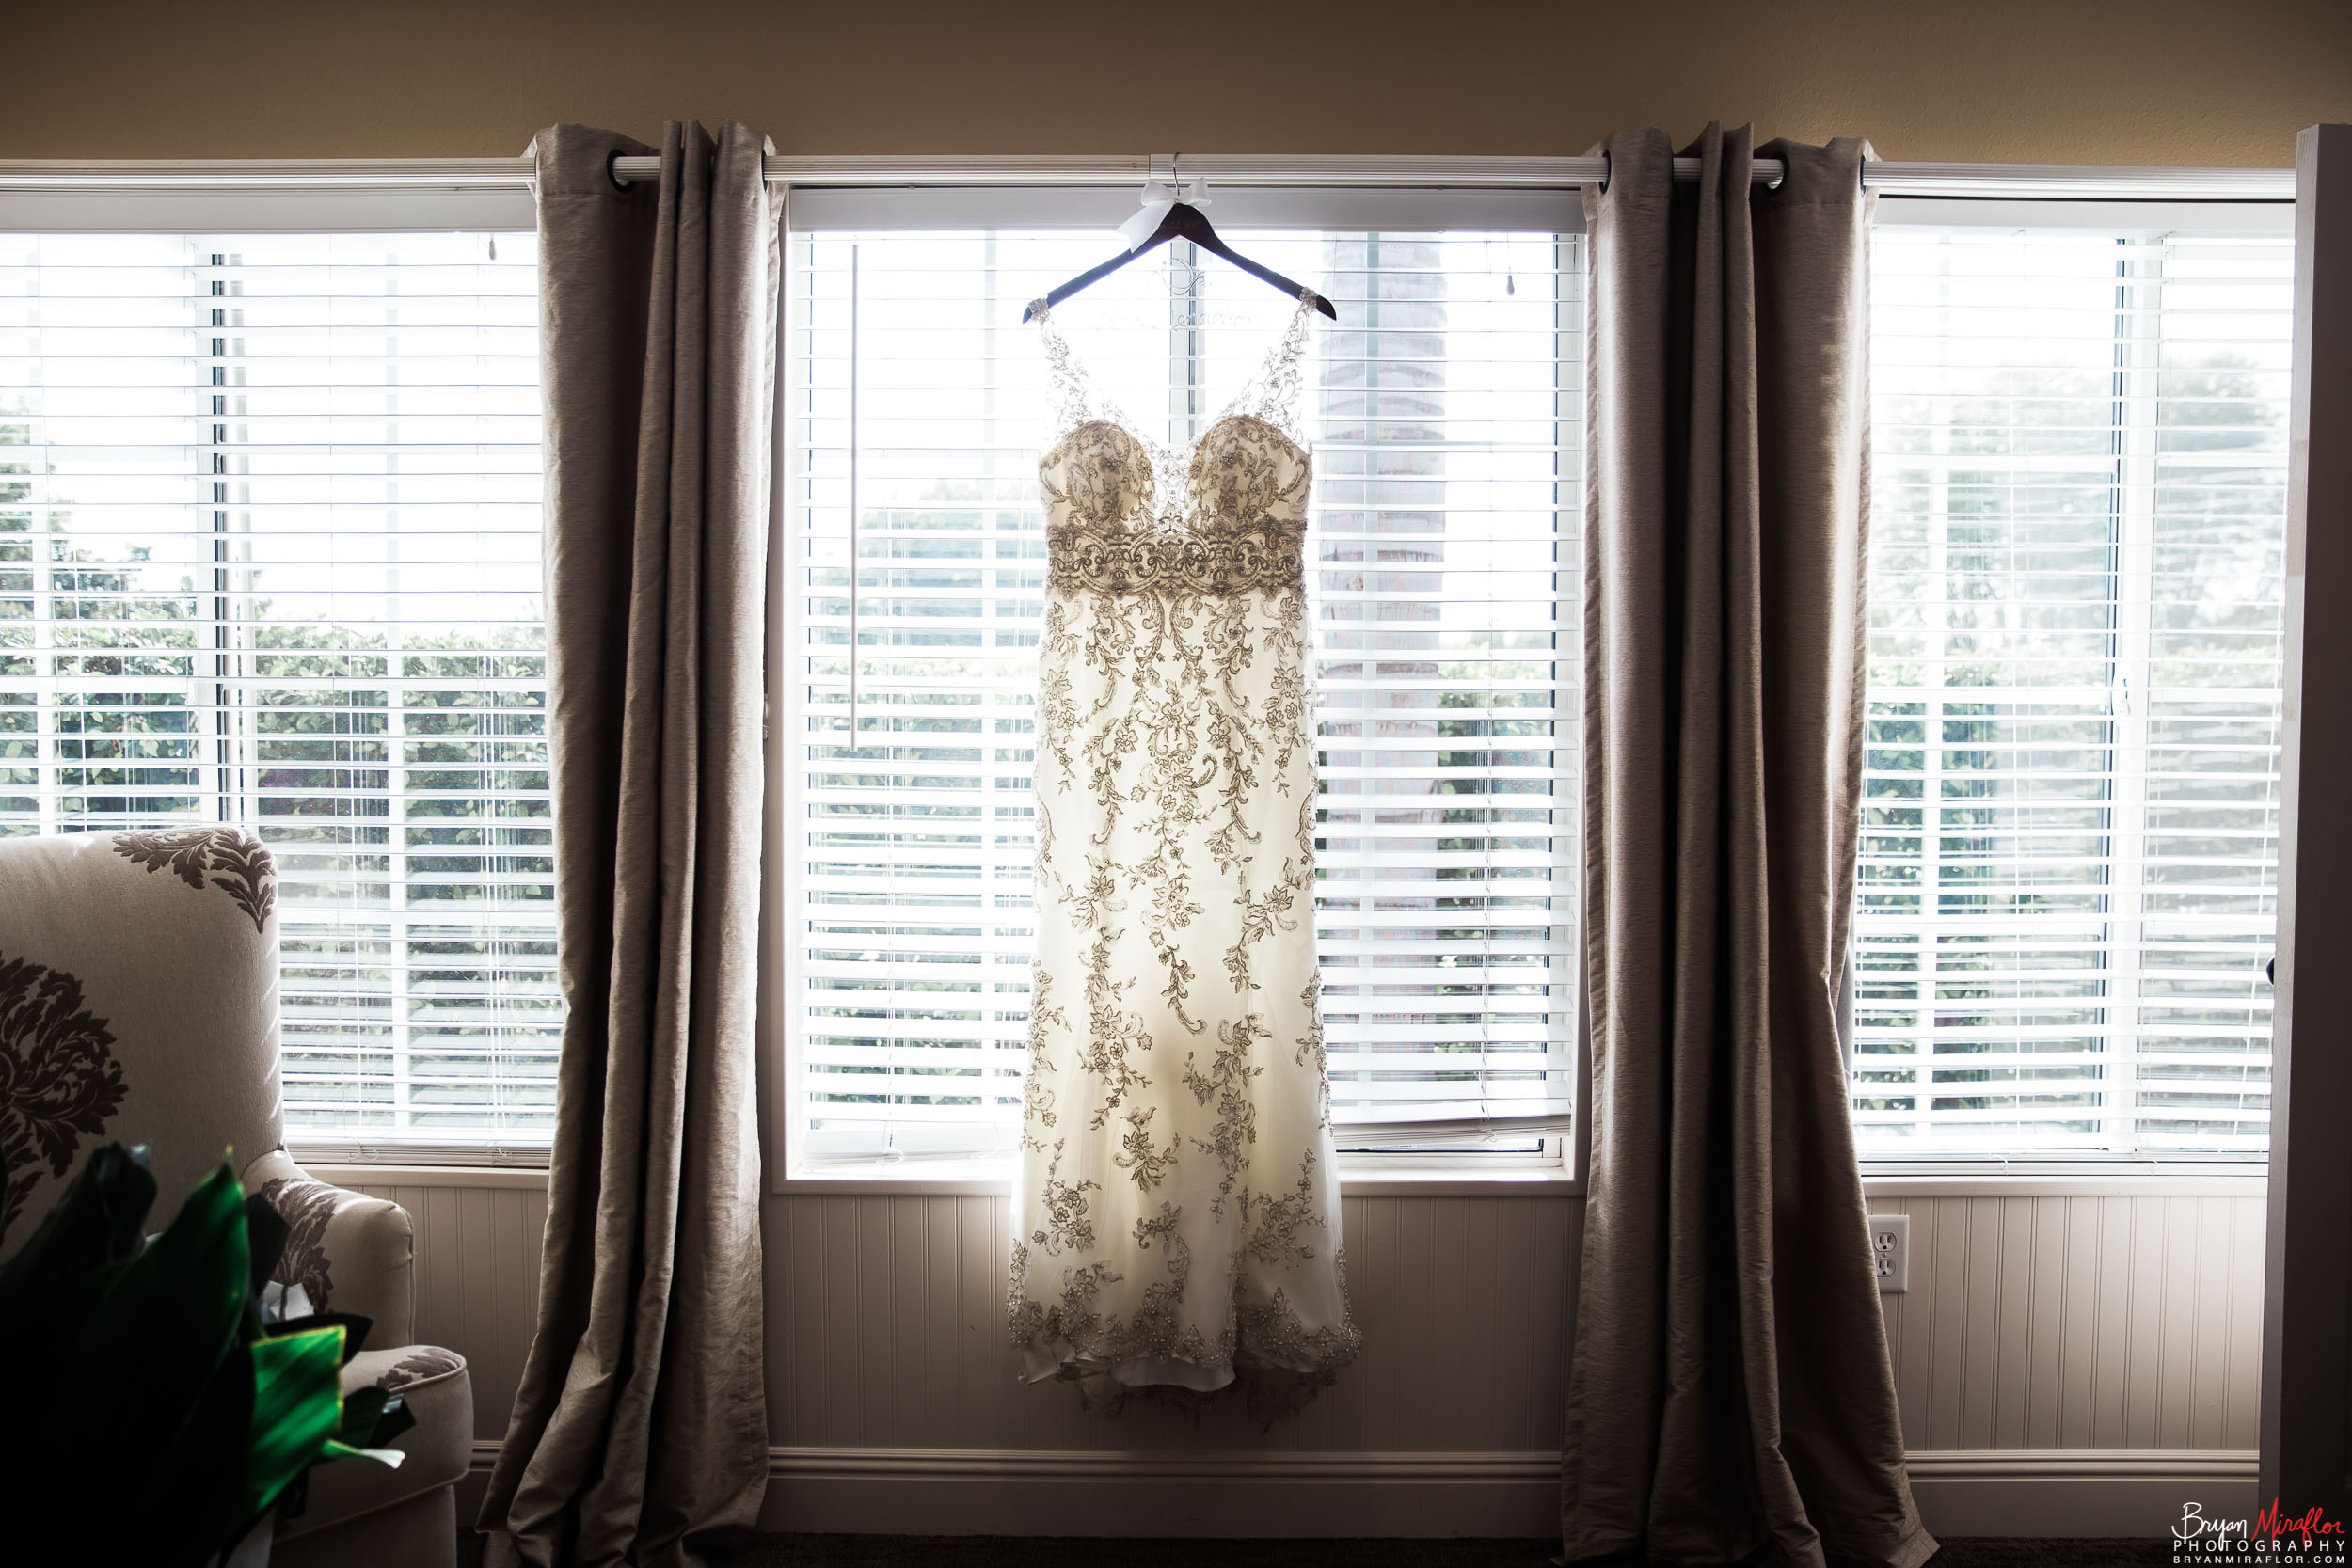 Bryan-Miraflor-Photography-Hannah-Jonathan-Married-Grand-Traditions-Estate-Gardens-Fallbrook-20171222-018.jpg